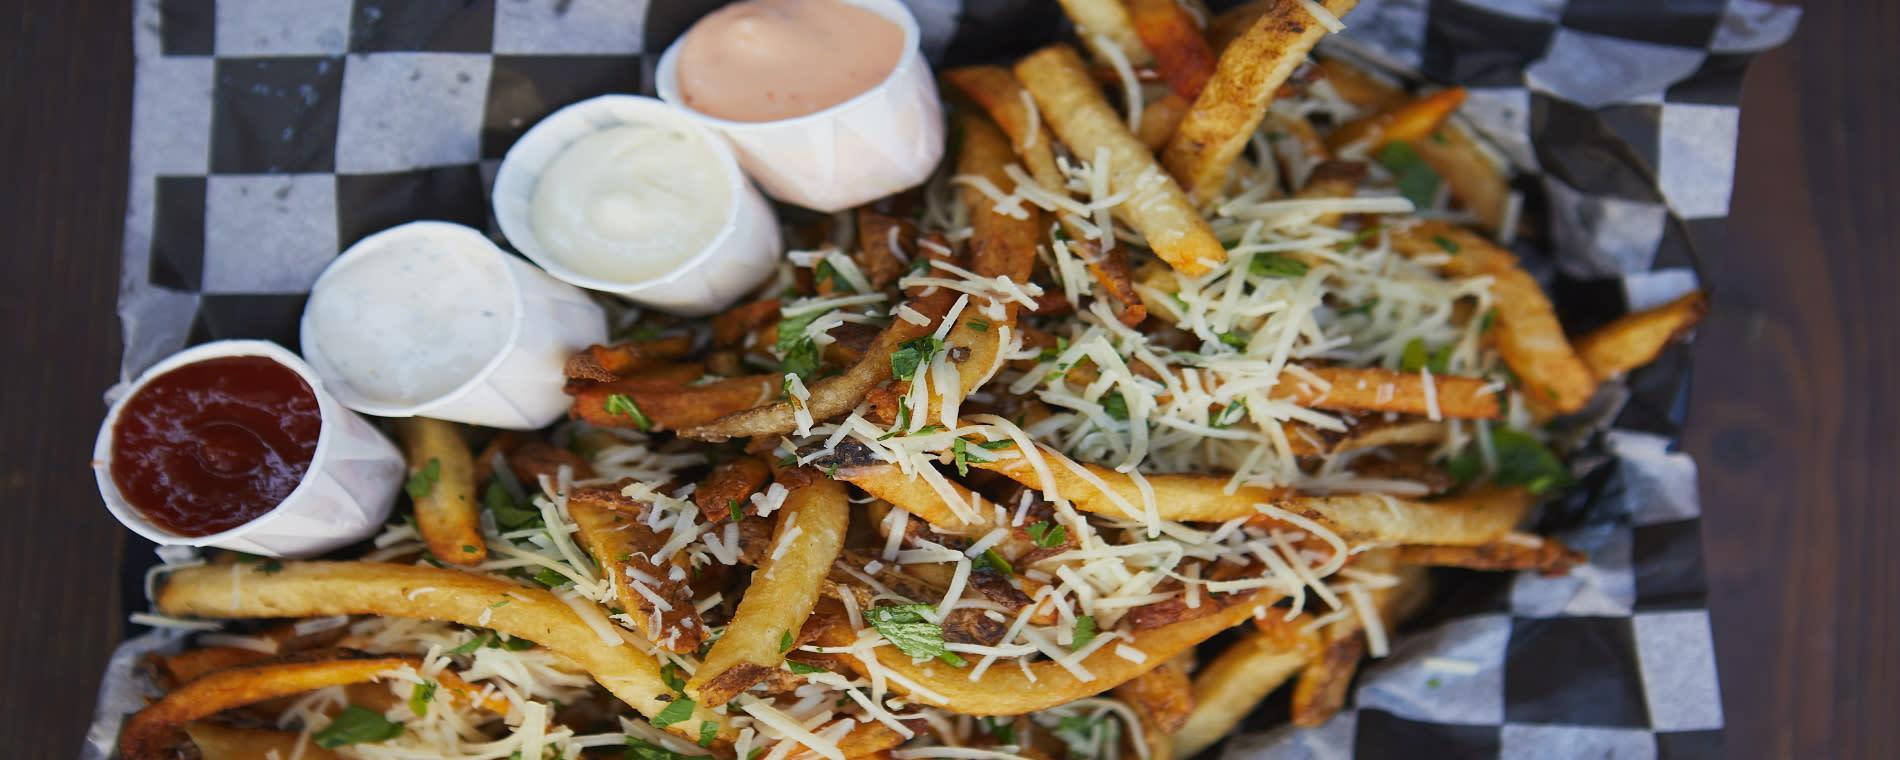 Dempseys Fries